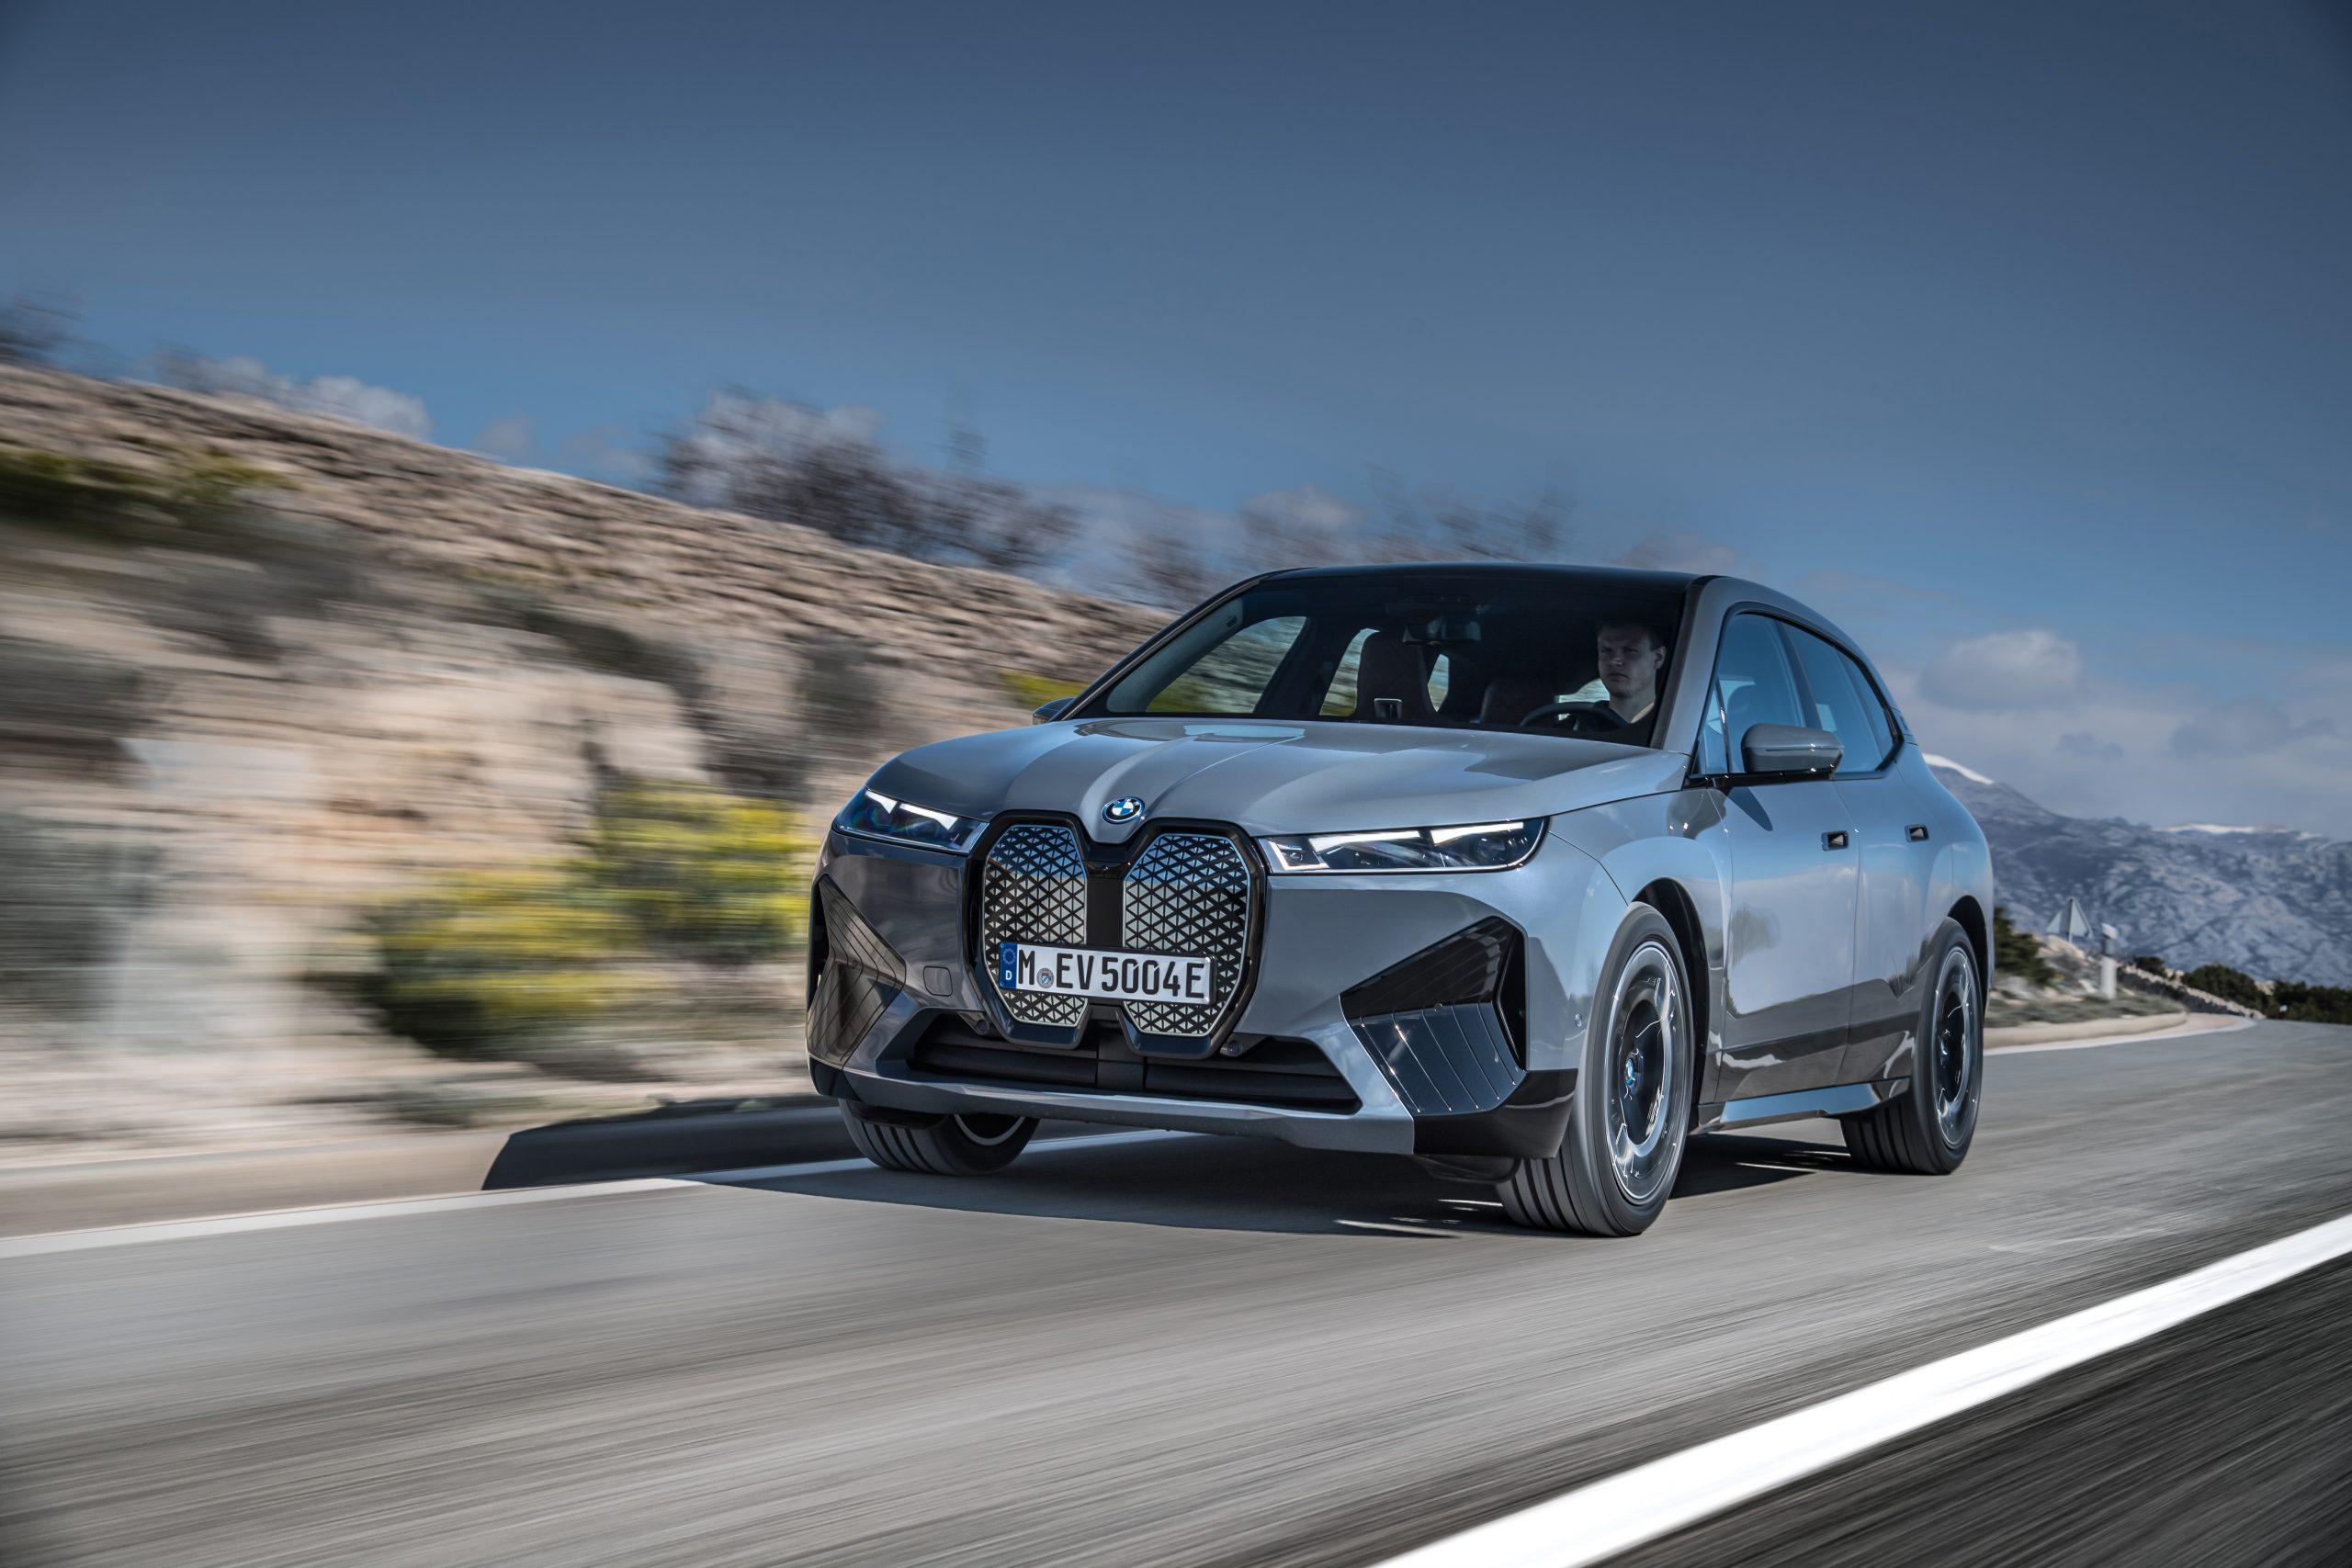 P90422124 highRes scaled Αύξηση - ρεκόρ στις πωλήσεις του BMW Group, για το πρώτο εξάμηνο της χρονιάς BMW, ειδήσεις, Νέα, πωλήσεις, πωλήσεις αυτοκινήτων